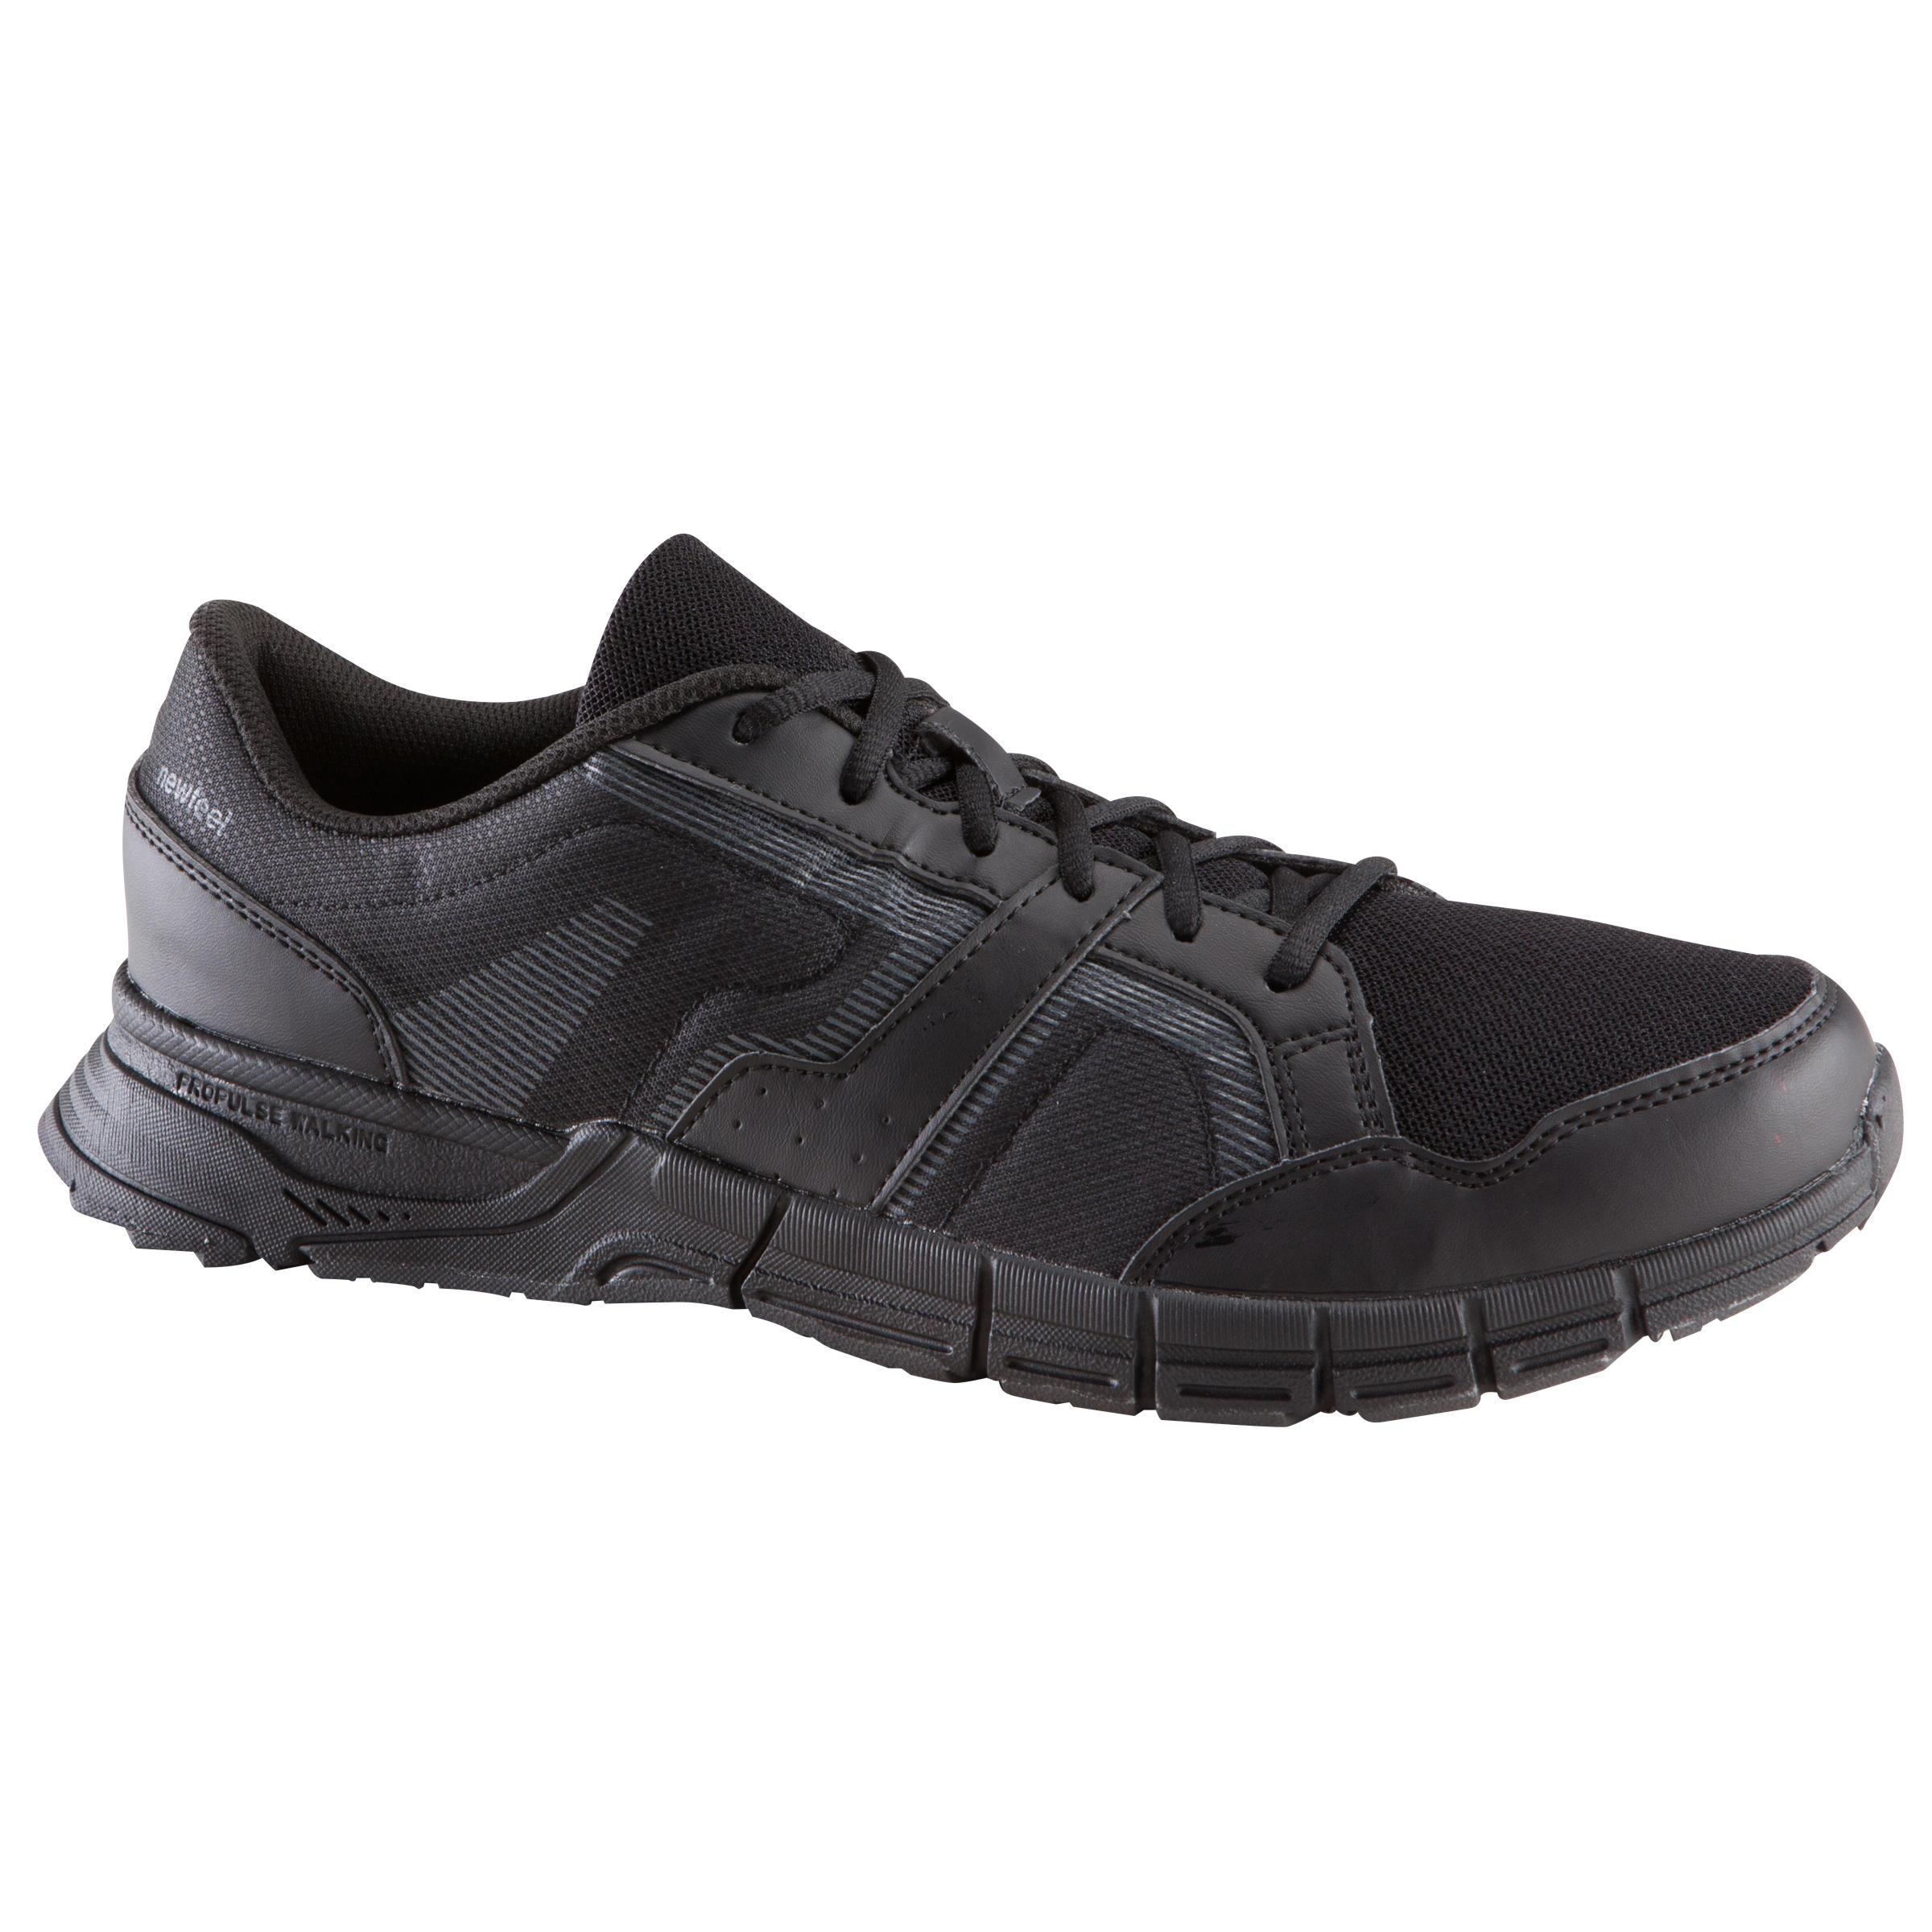 Tenis de caminata deportiva hombre Propulse Walk 100 negro